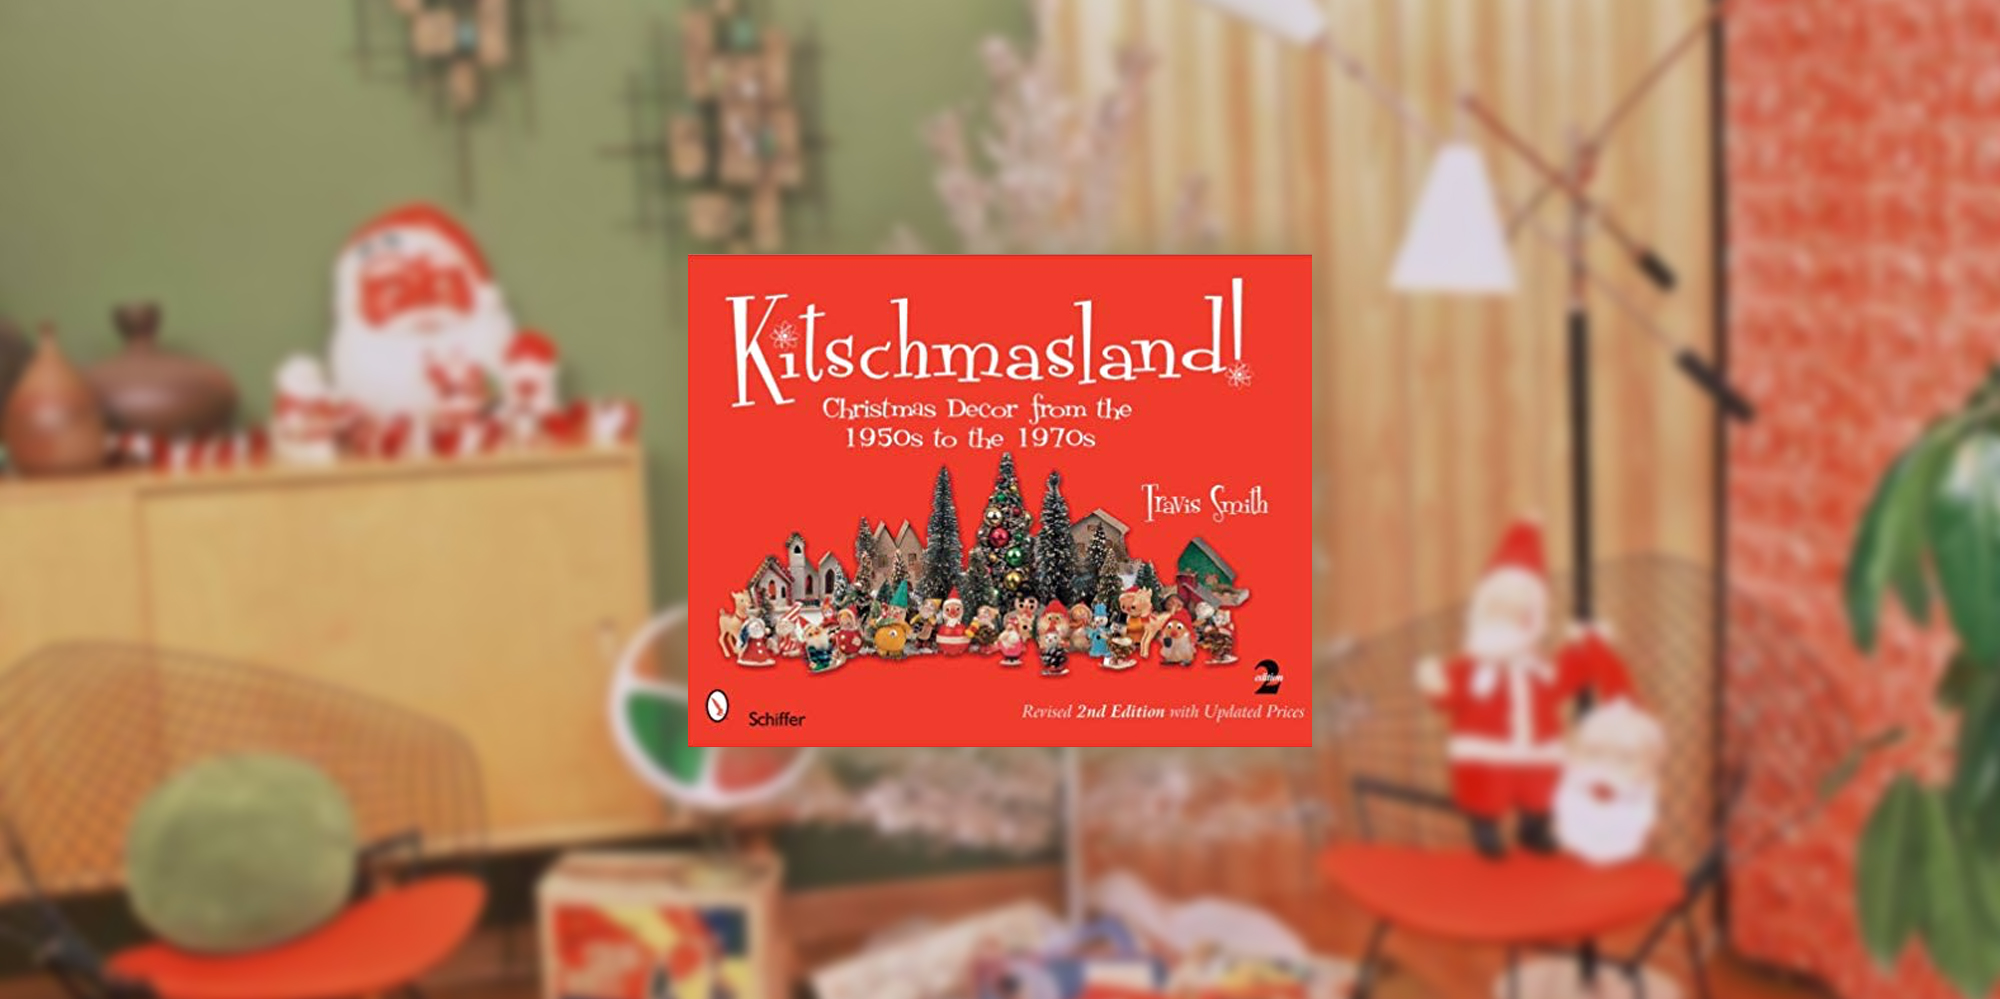 kitschmasland-book-holiday-gift-guide-bro-bear-blog.jpg